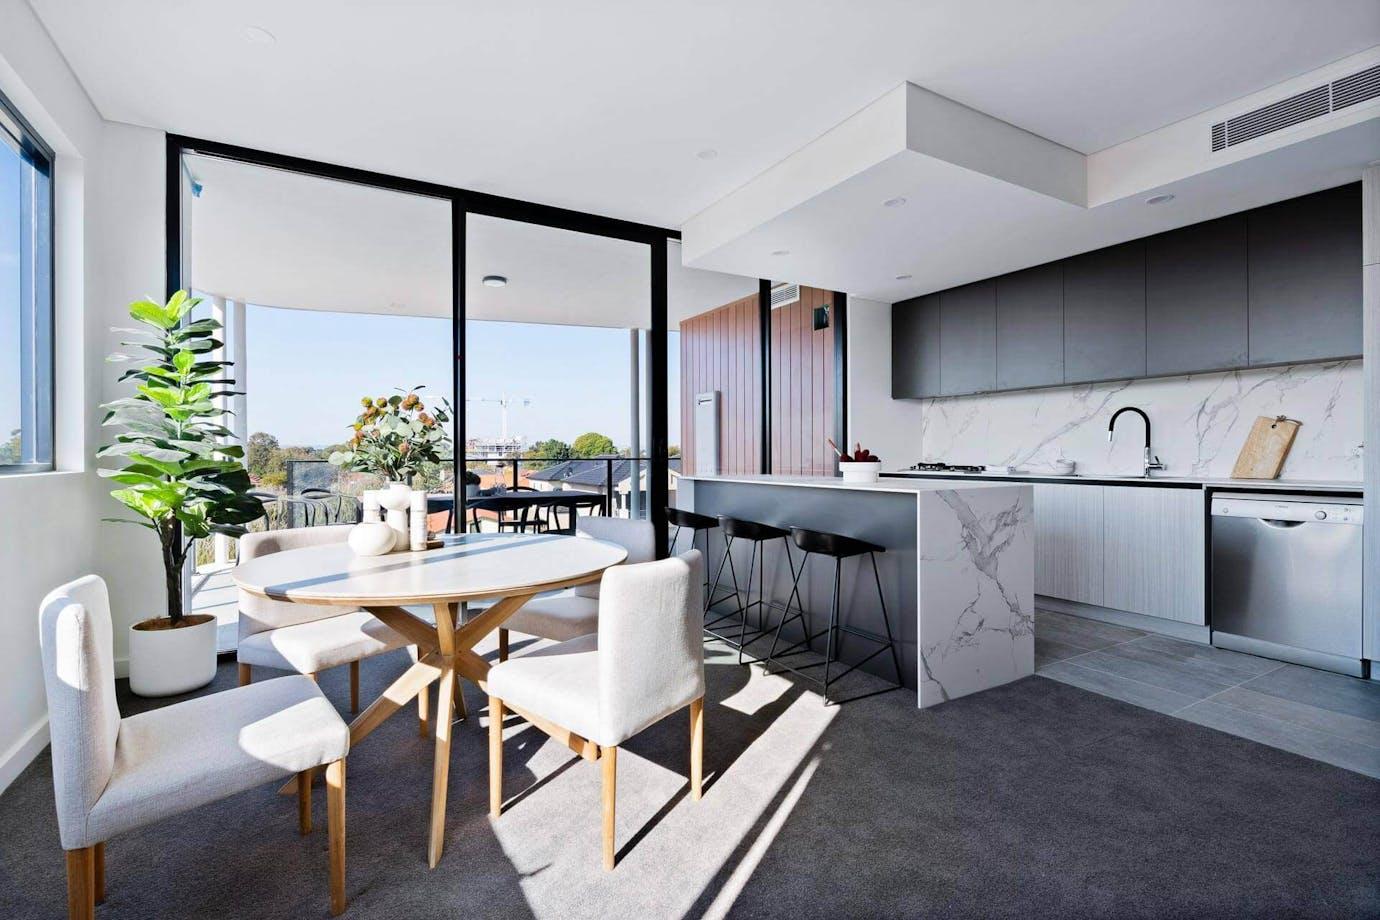 [DK] Edition & Carrington Apartments - Countertops